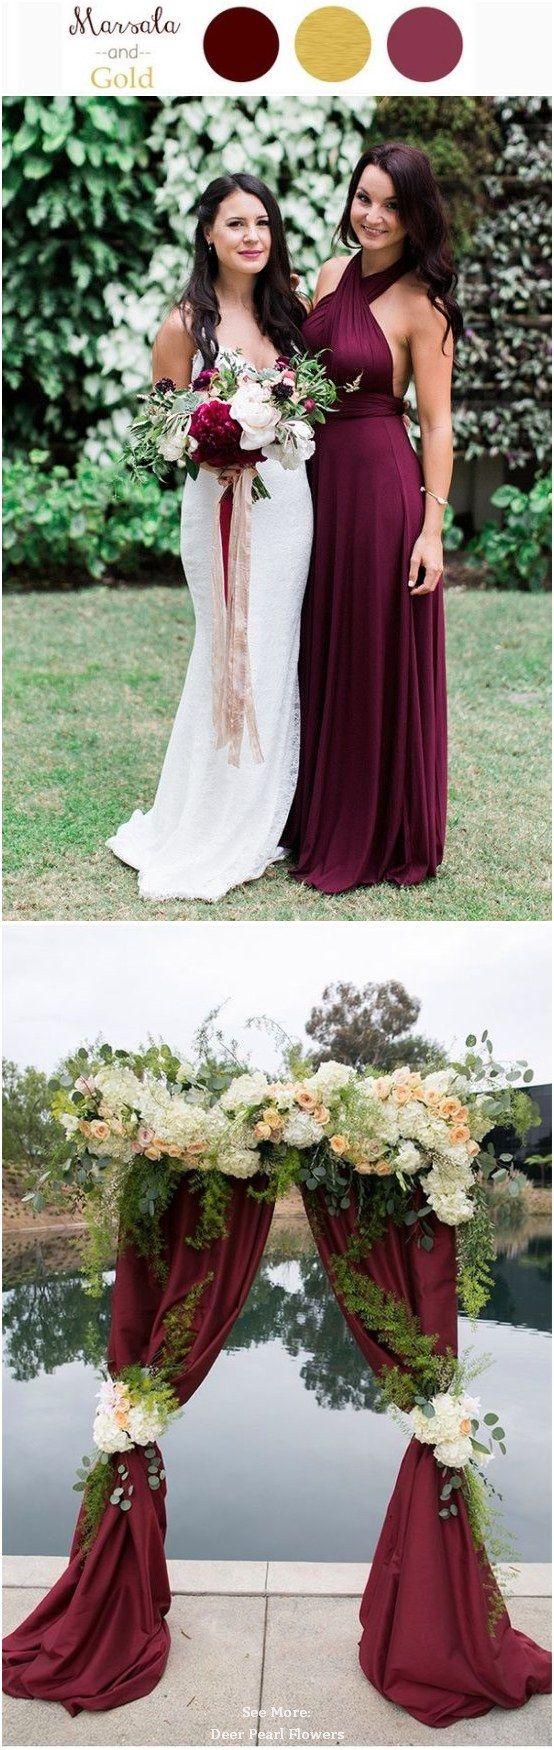 30 Elegant Fall Burgundy and Gold Wedding Ideas / http://www.deerpearlflowers.com/burgundy-and-gold-wedding-ideas/